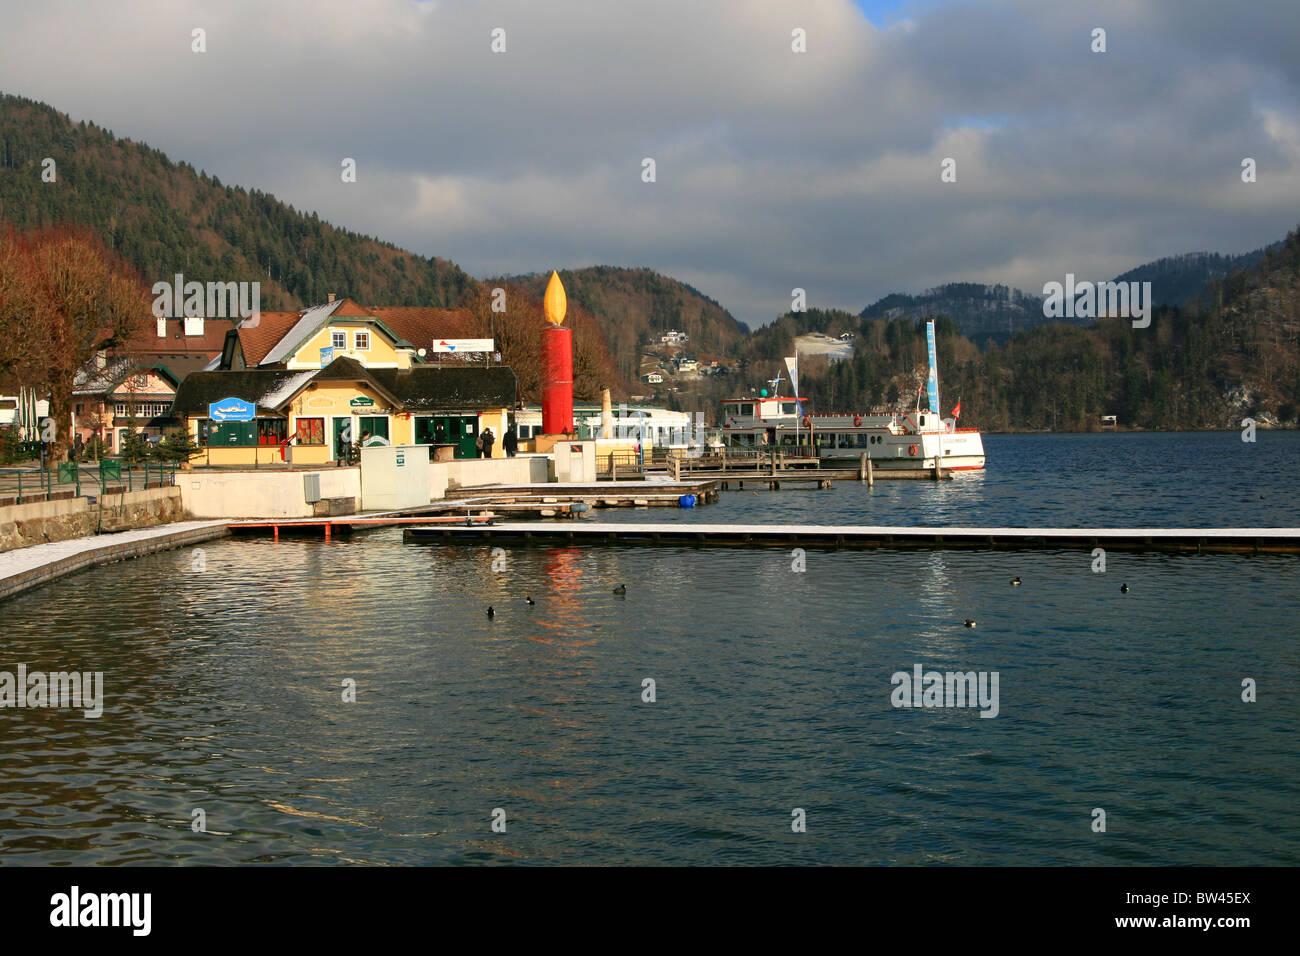 Sankt Gilgen at Christmas, Austria, Europe - Stock Image